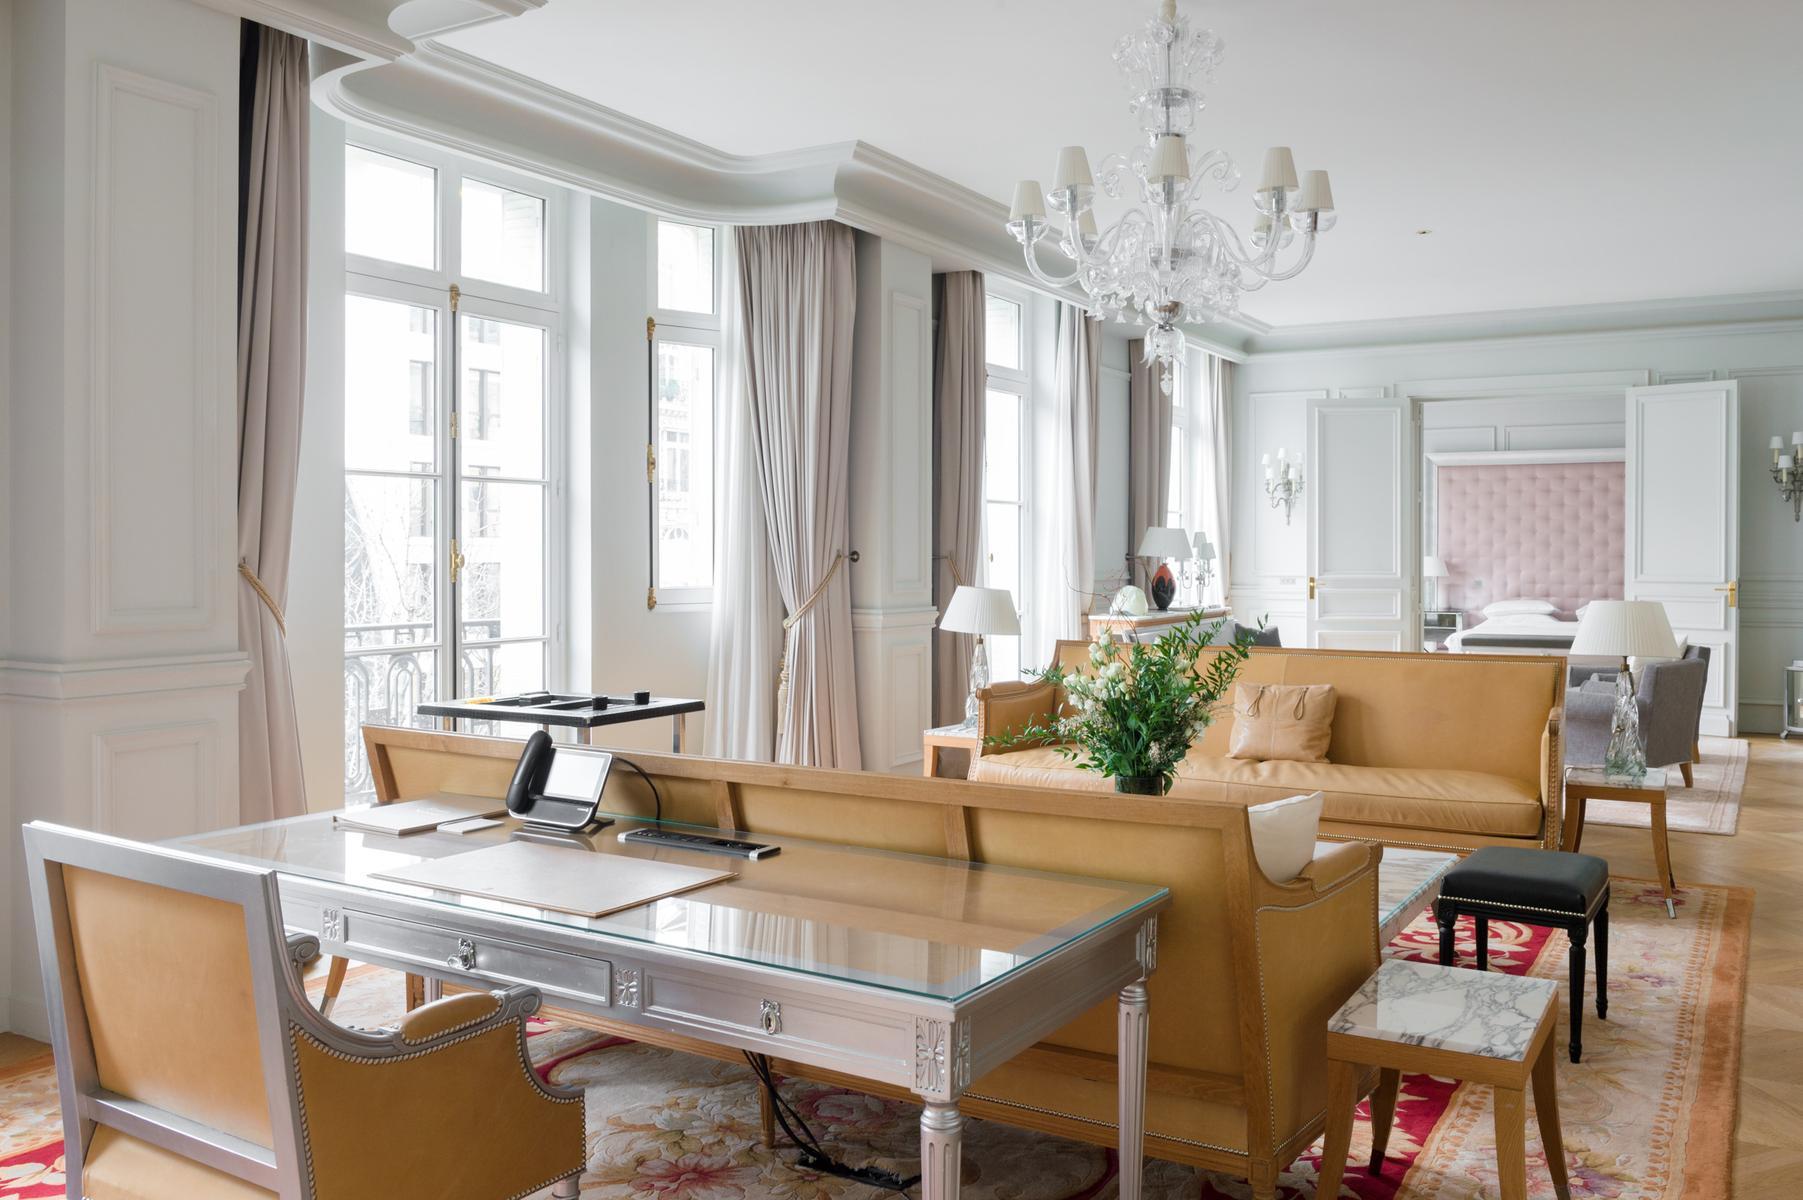 Paris - Avenue Hoche II